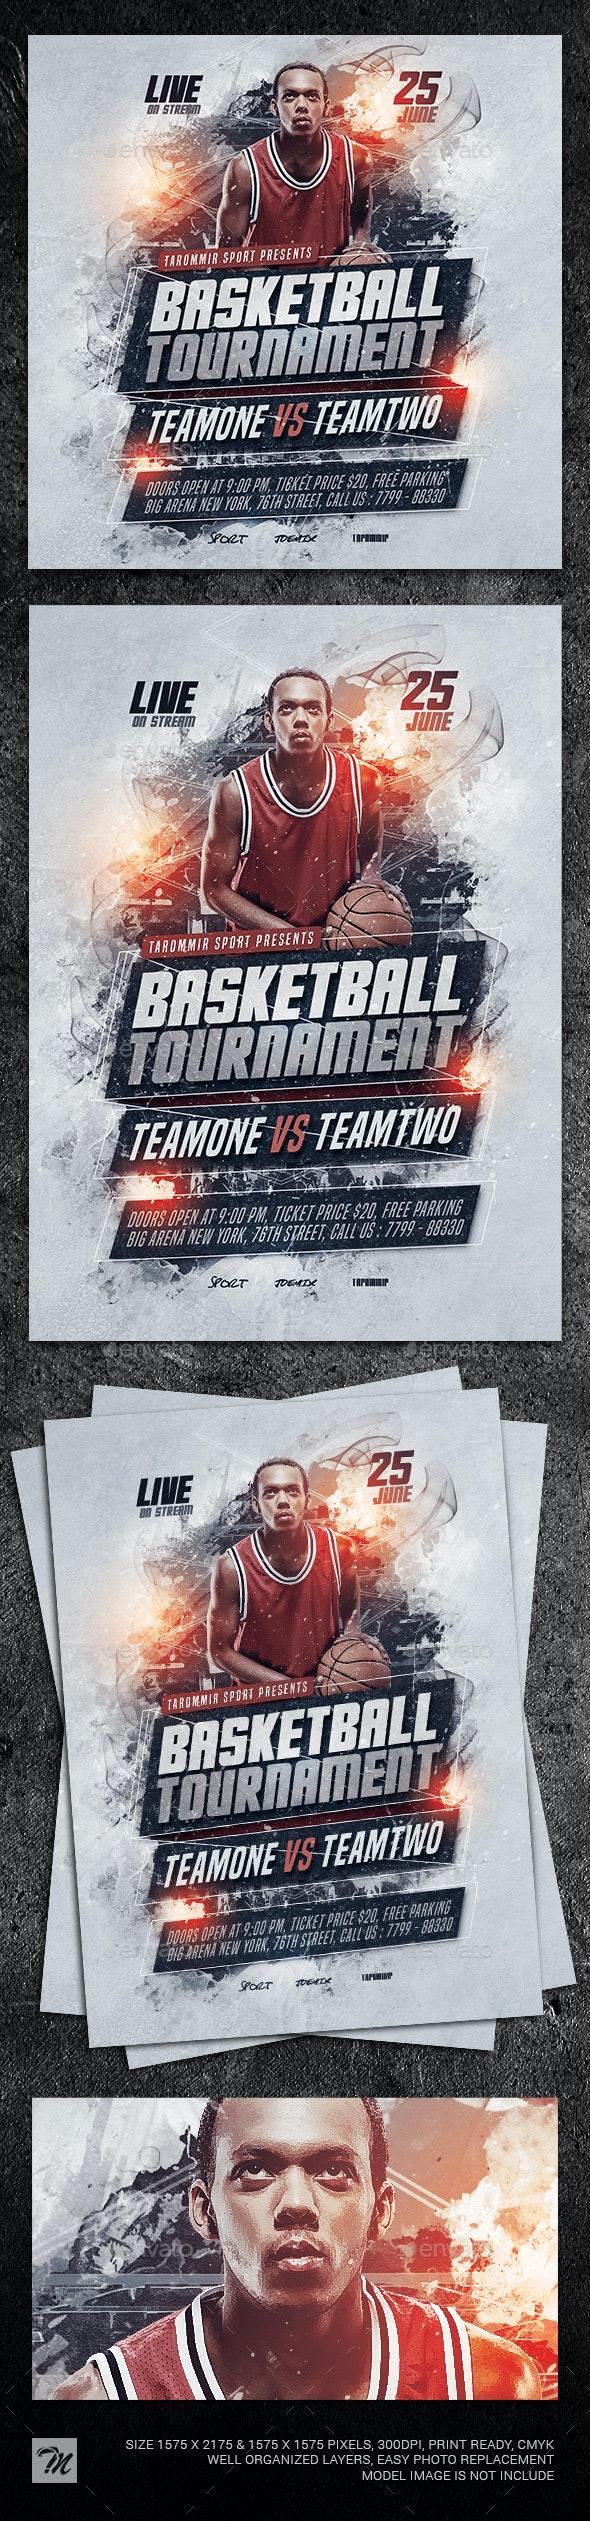 Basketball Tournament Flyer - Sports Events